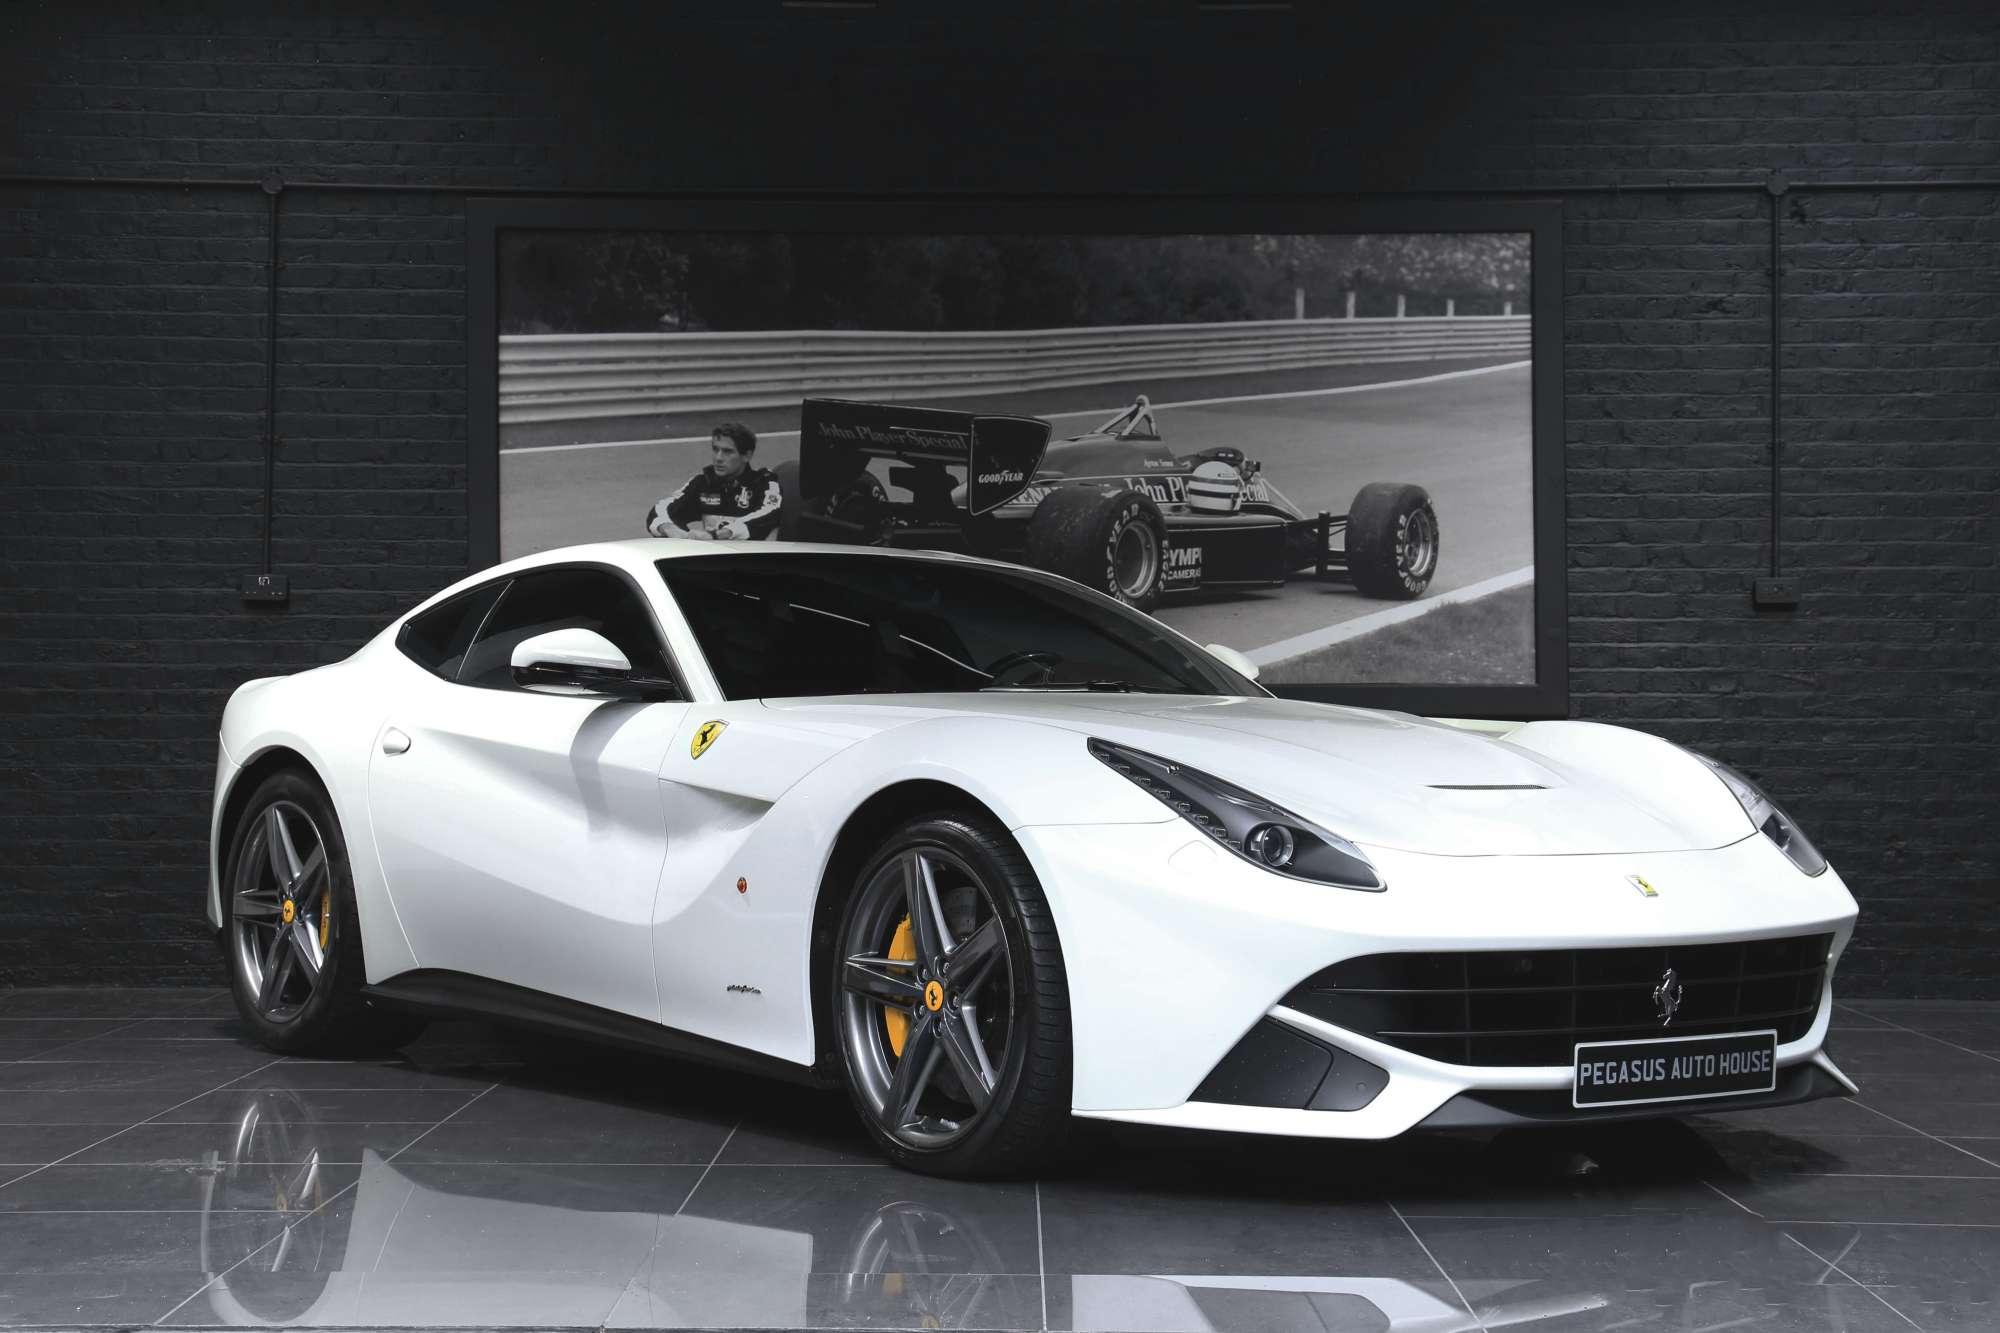 Lhd Ferrari F12 Pegasus Auto House